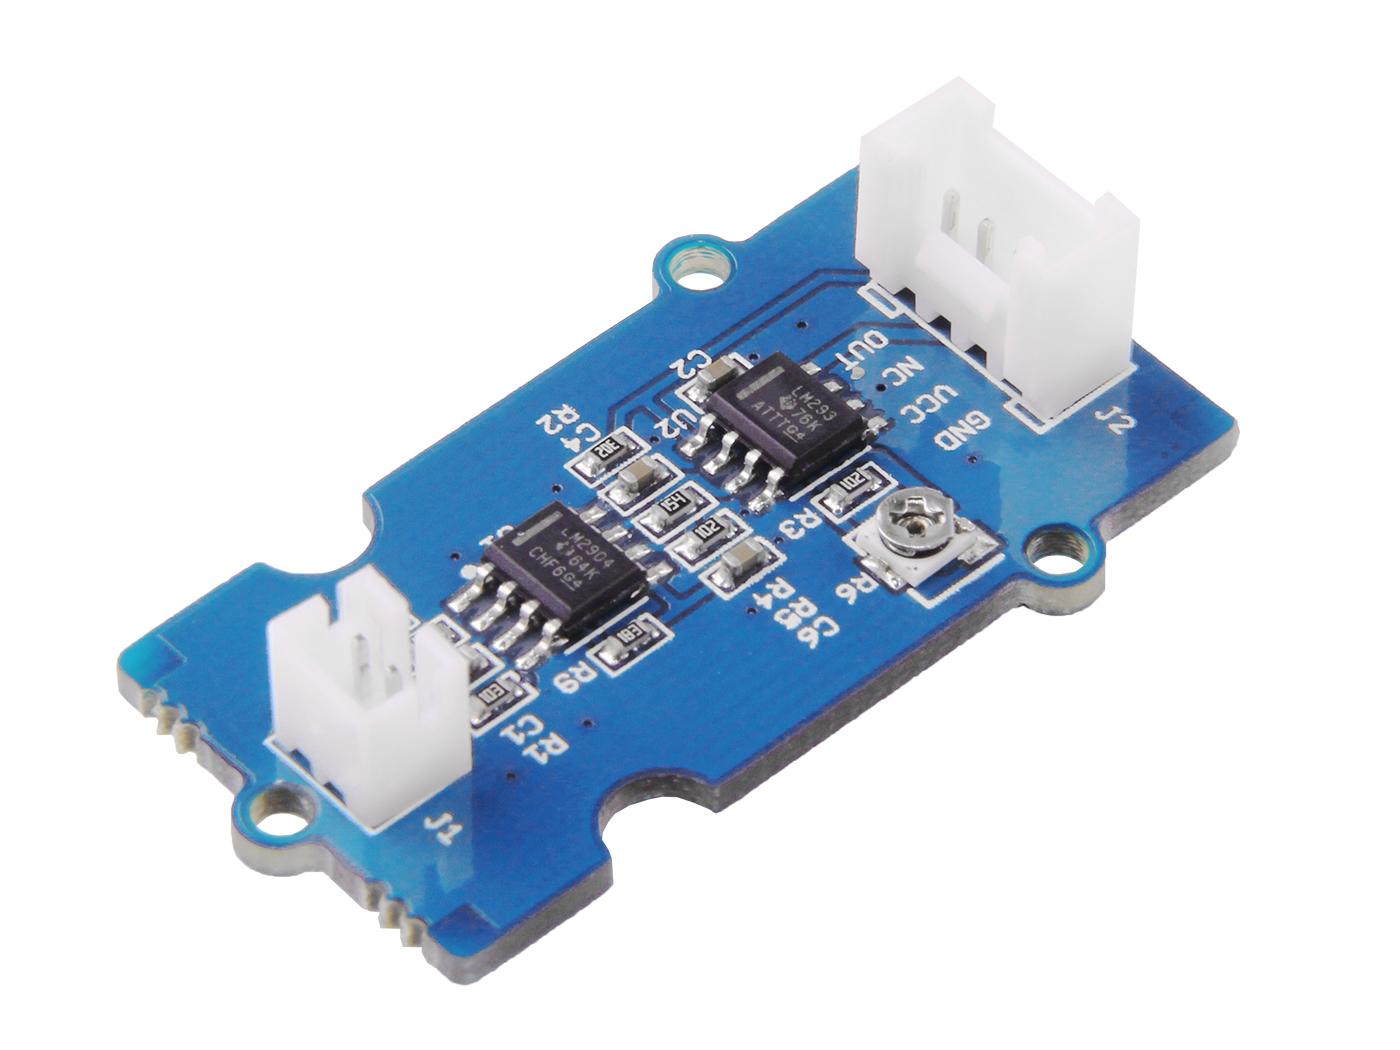 Grove Piezo Vibration Sensor Seeed Studio Charge Amplifier Circuit For Measuring Strain With Piezoelectrics